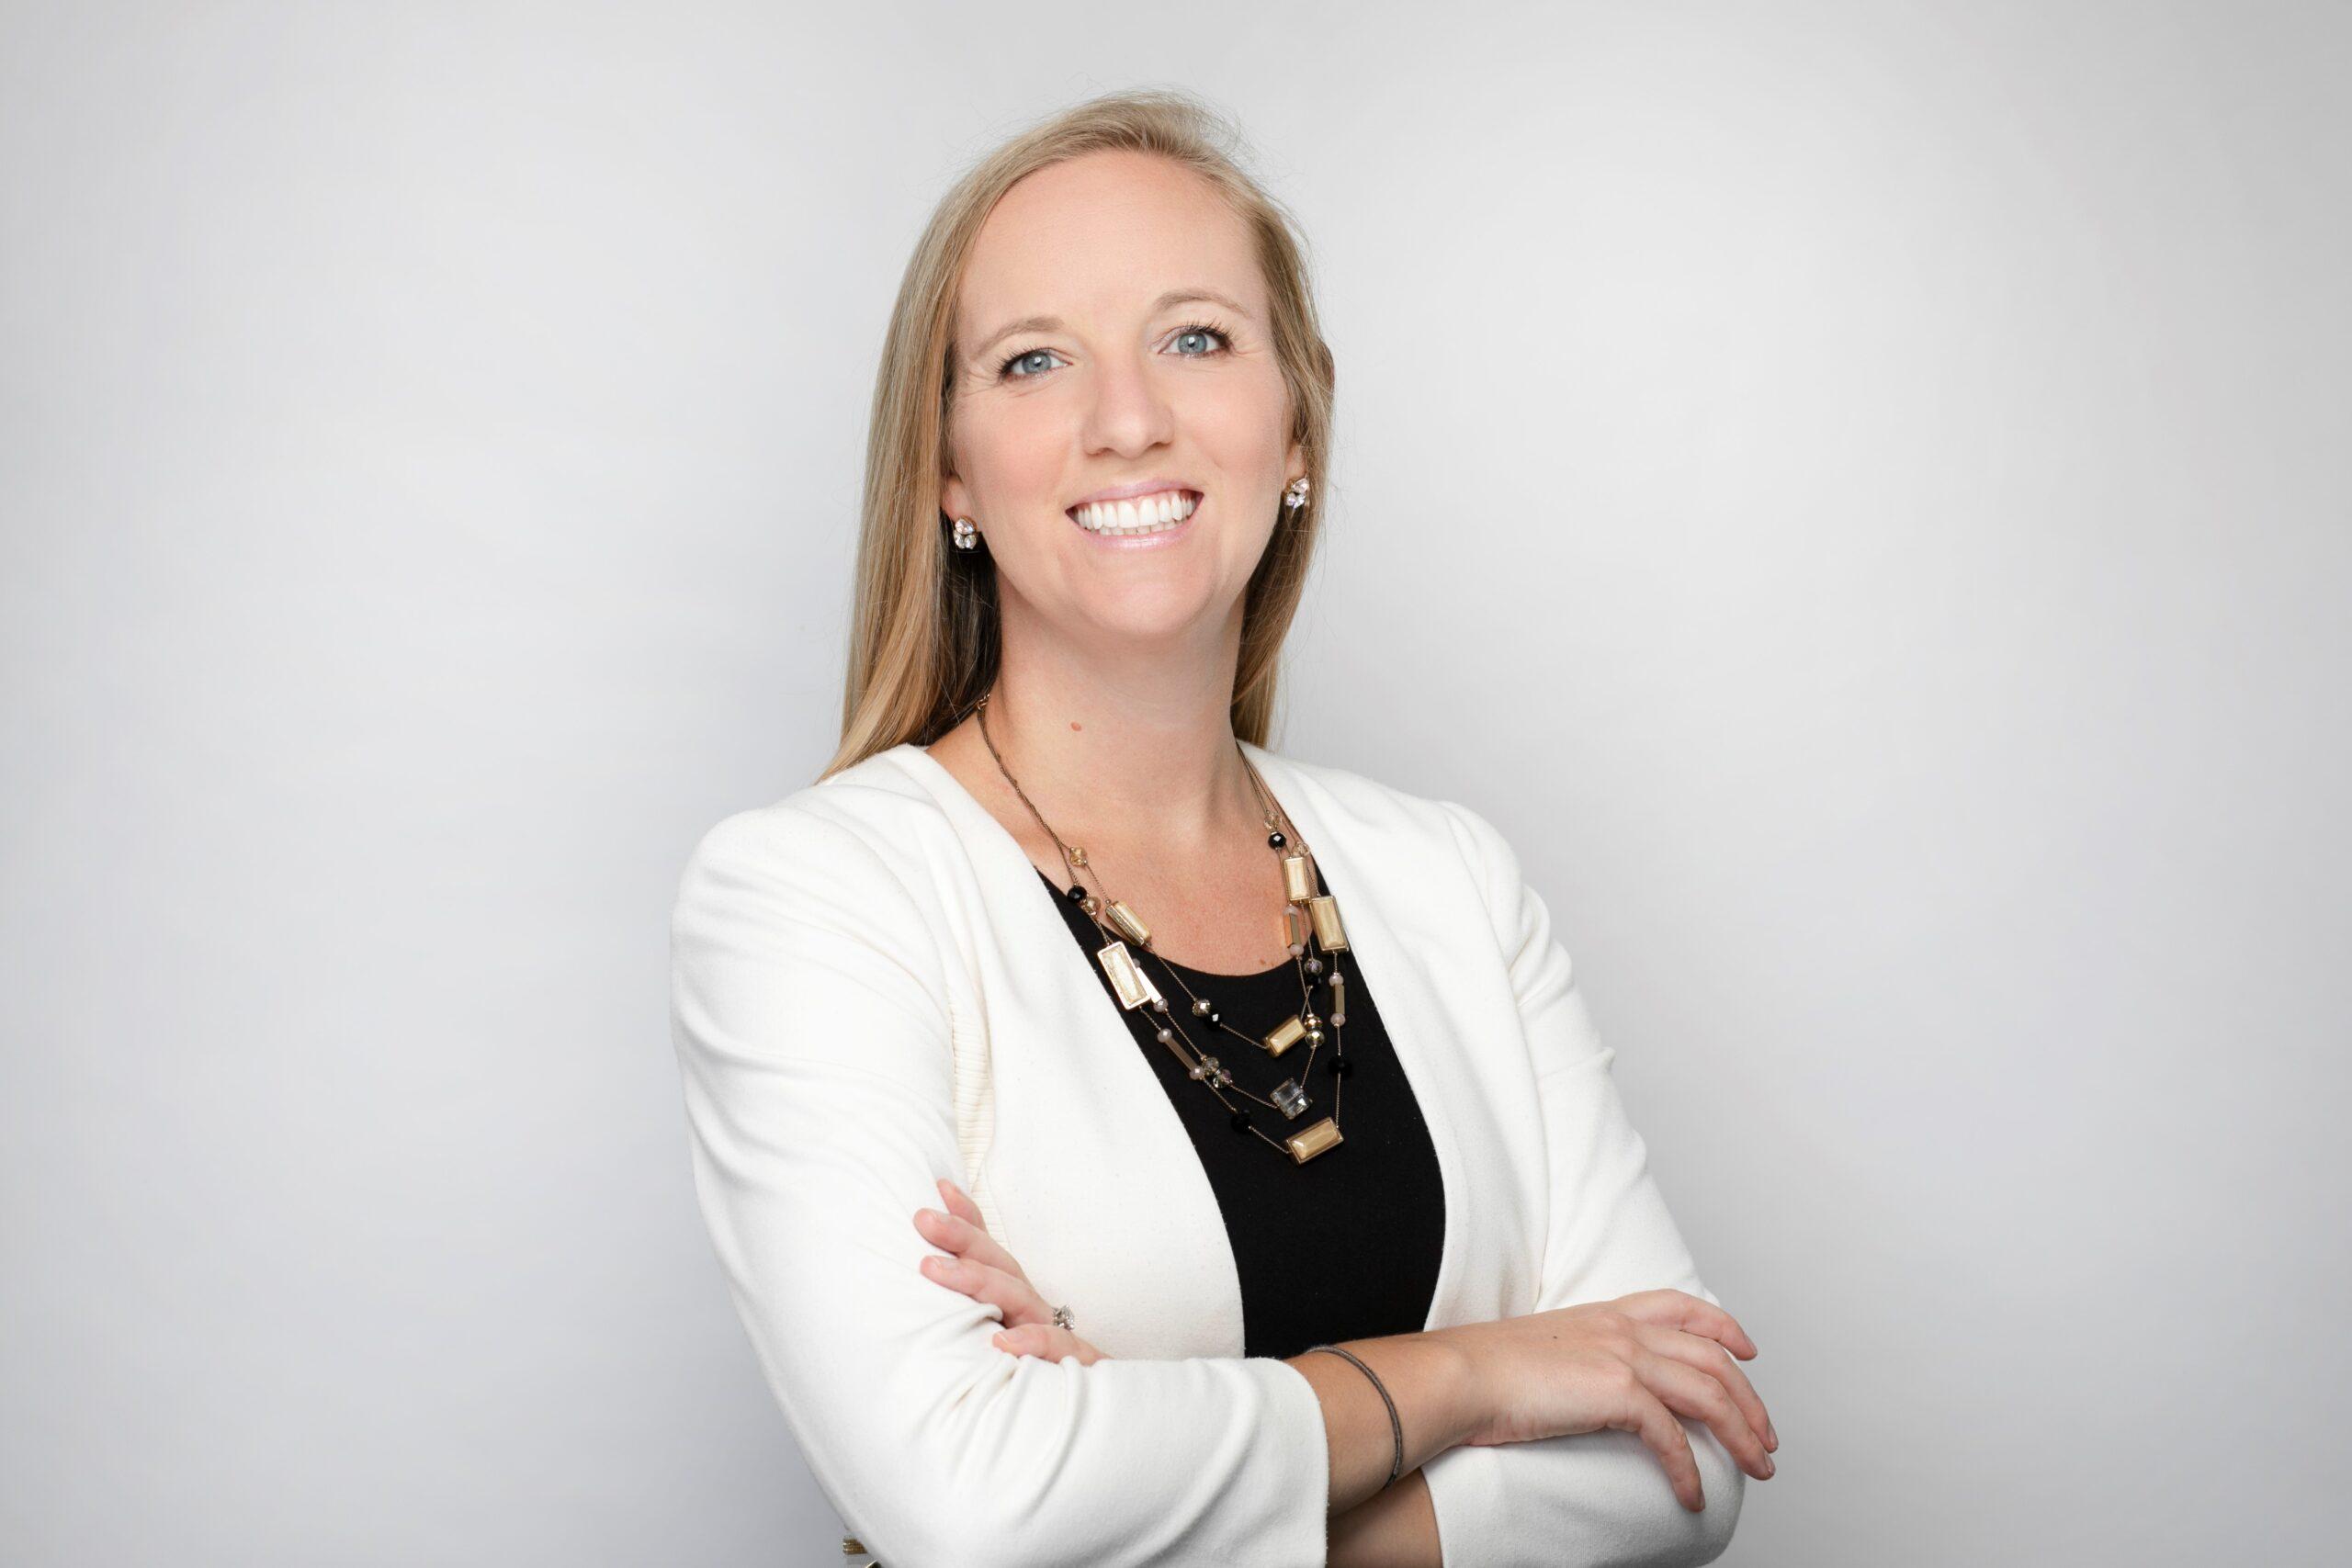 Heather M. Lawson